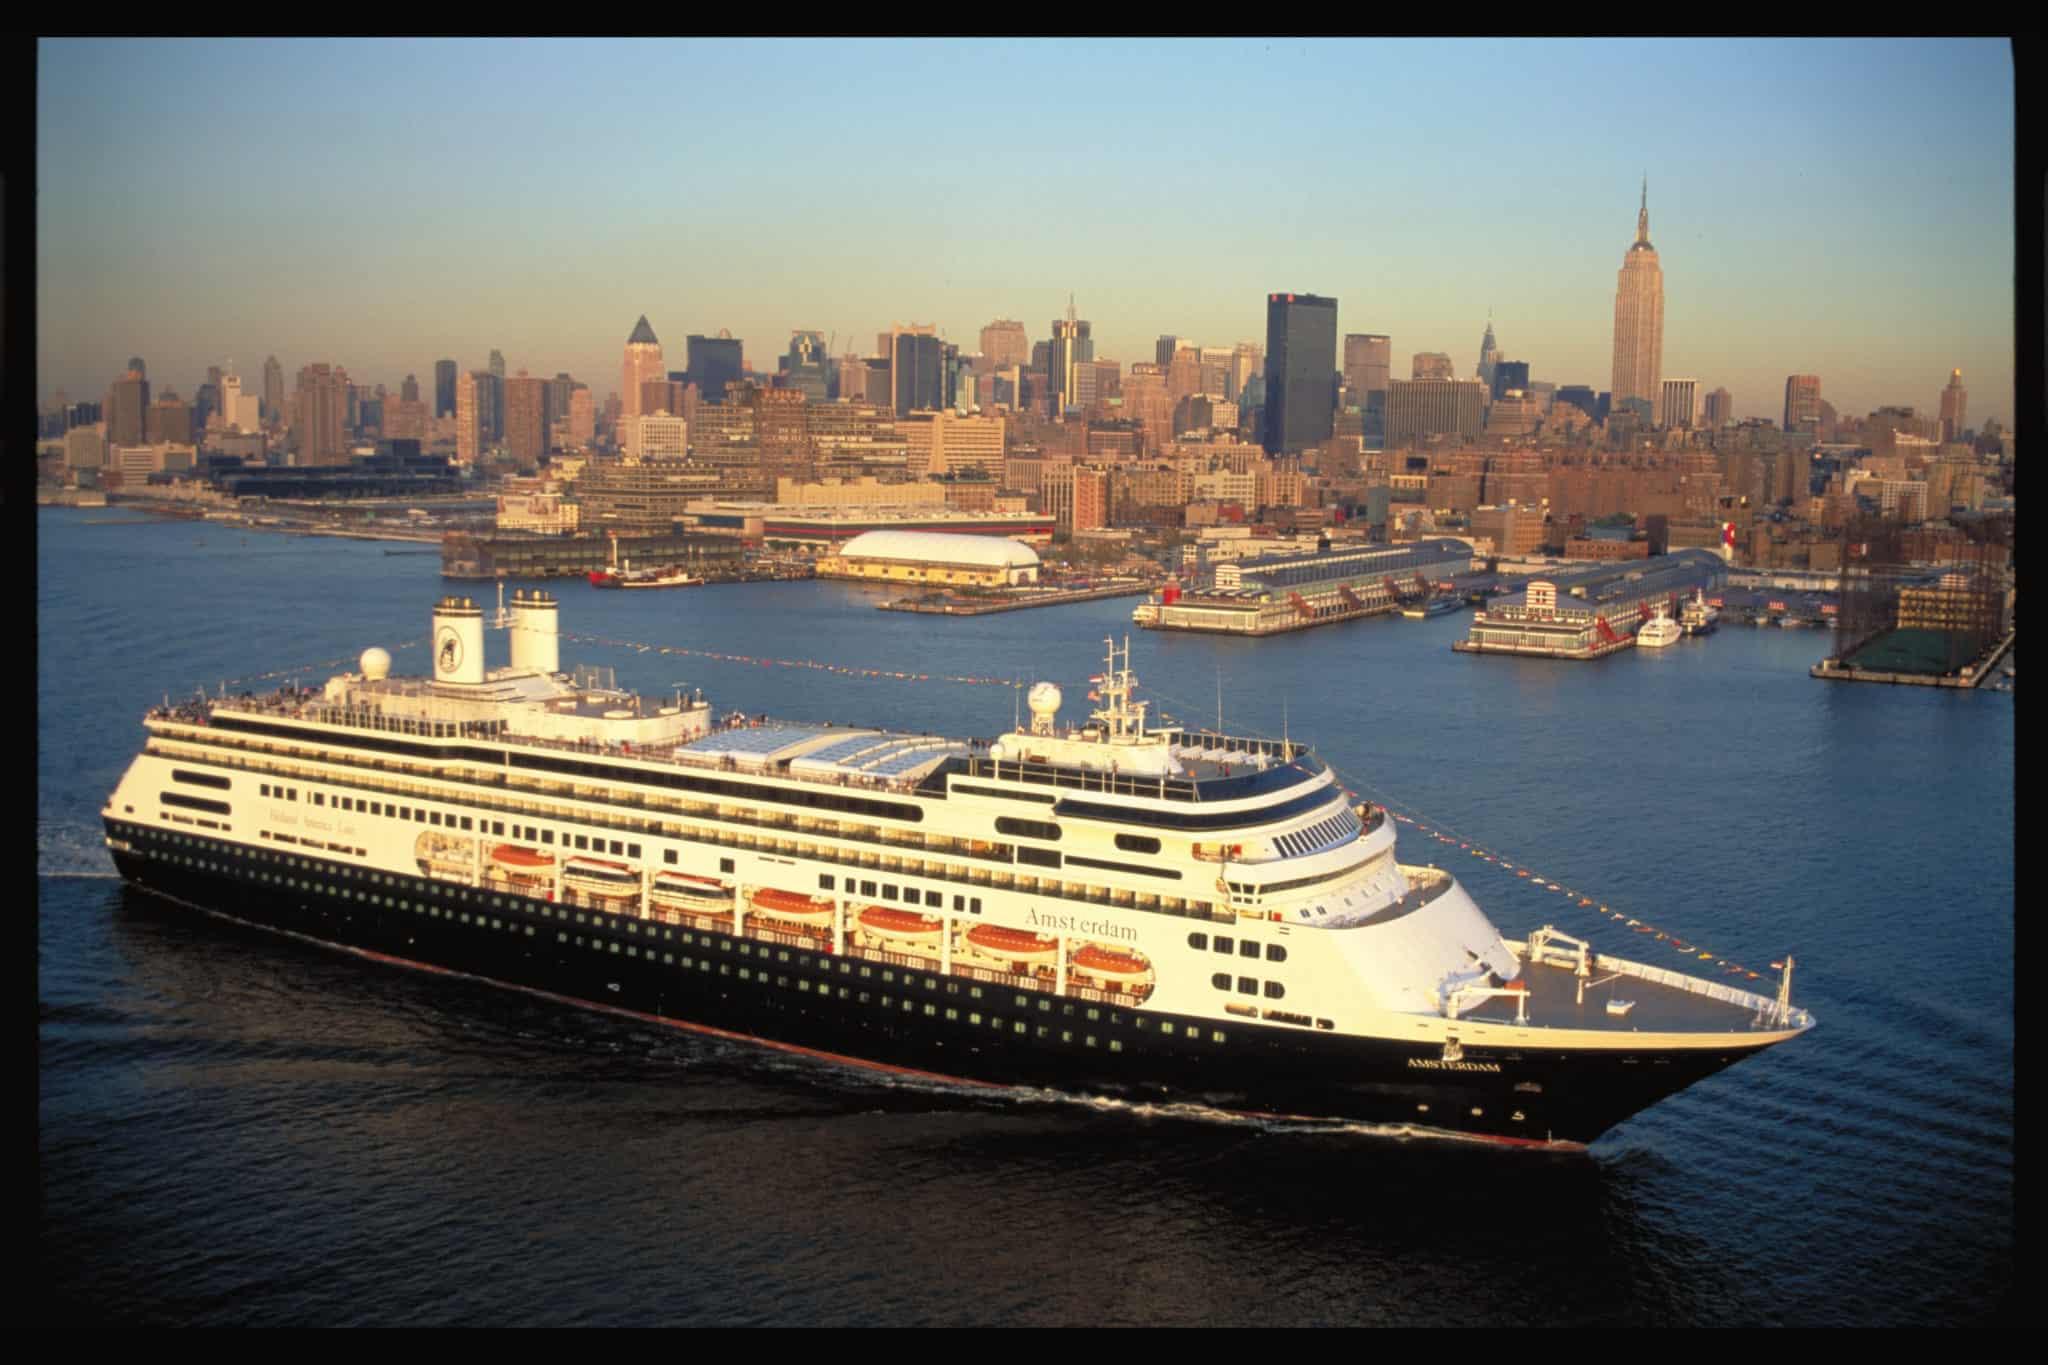 ms amsterdam holland america cruise